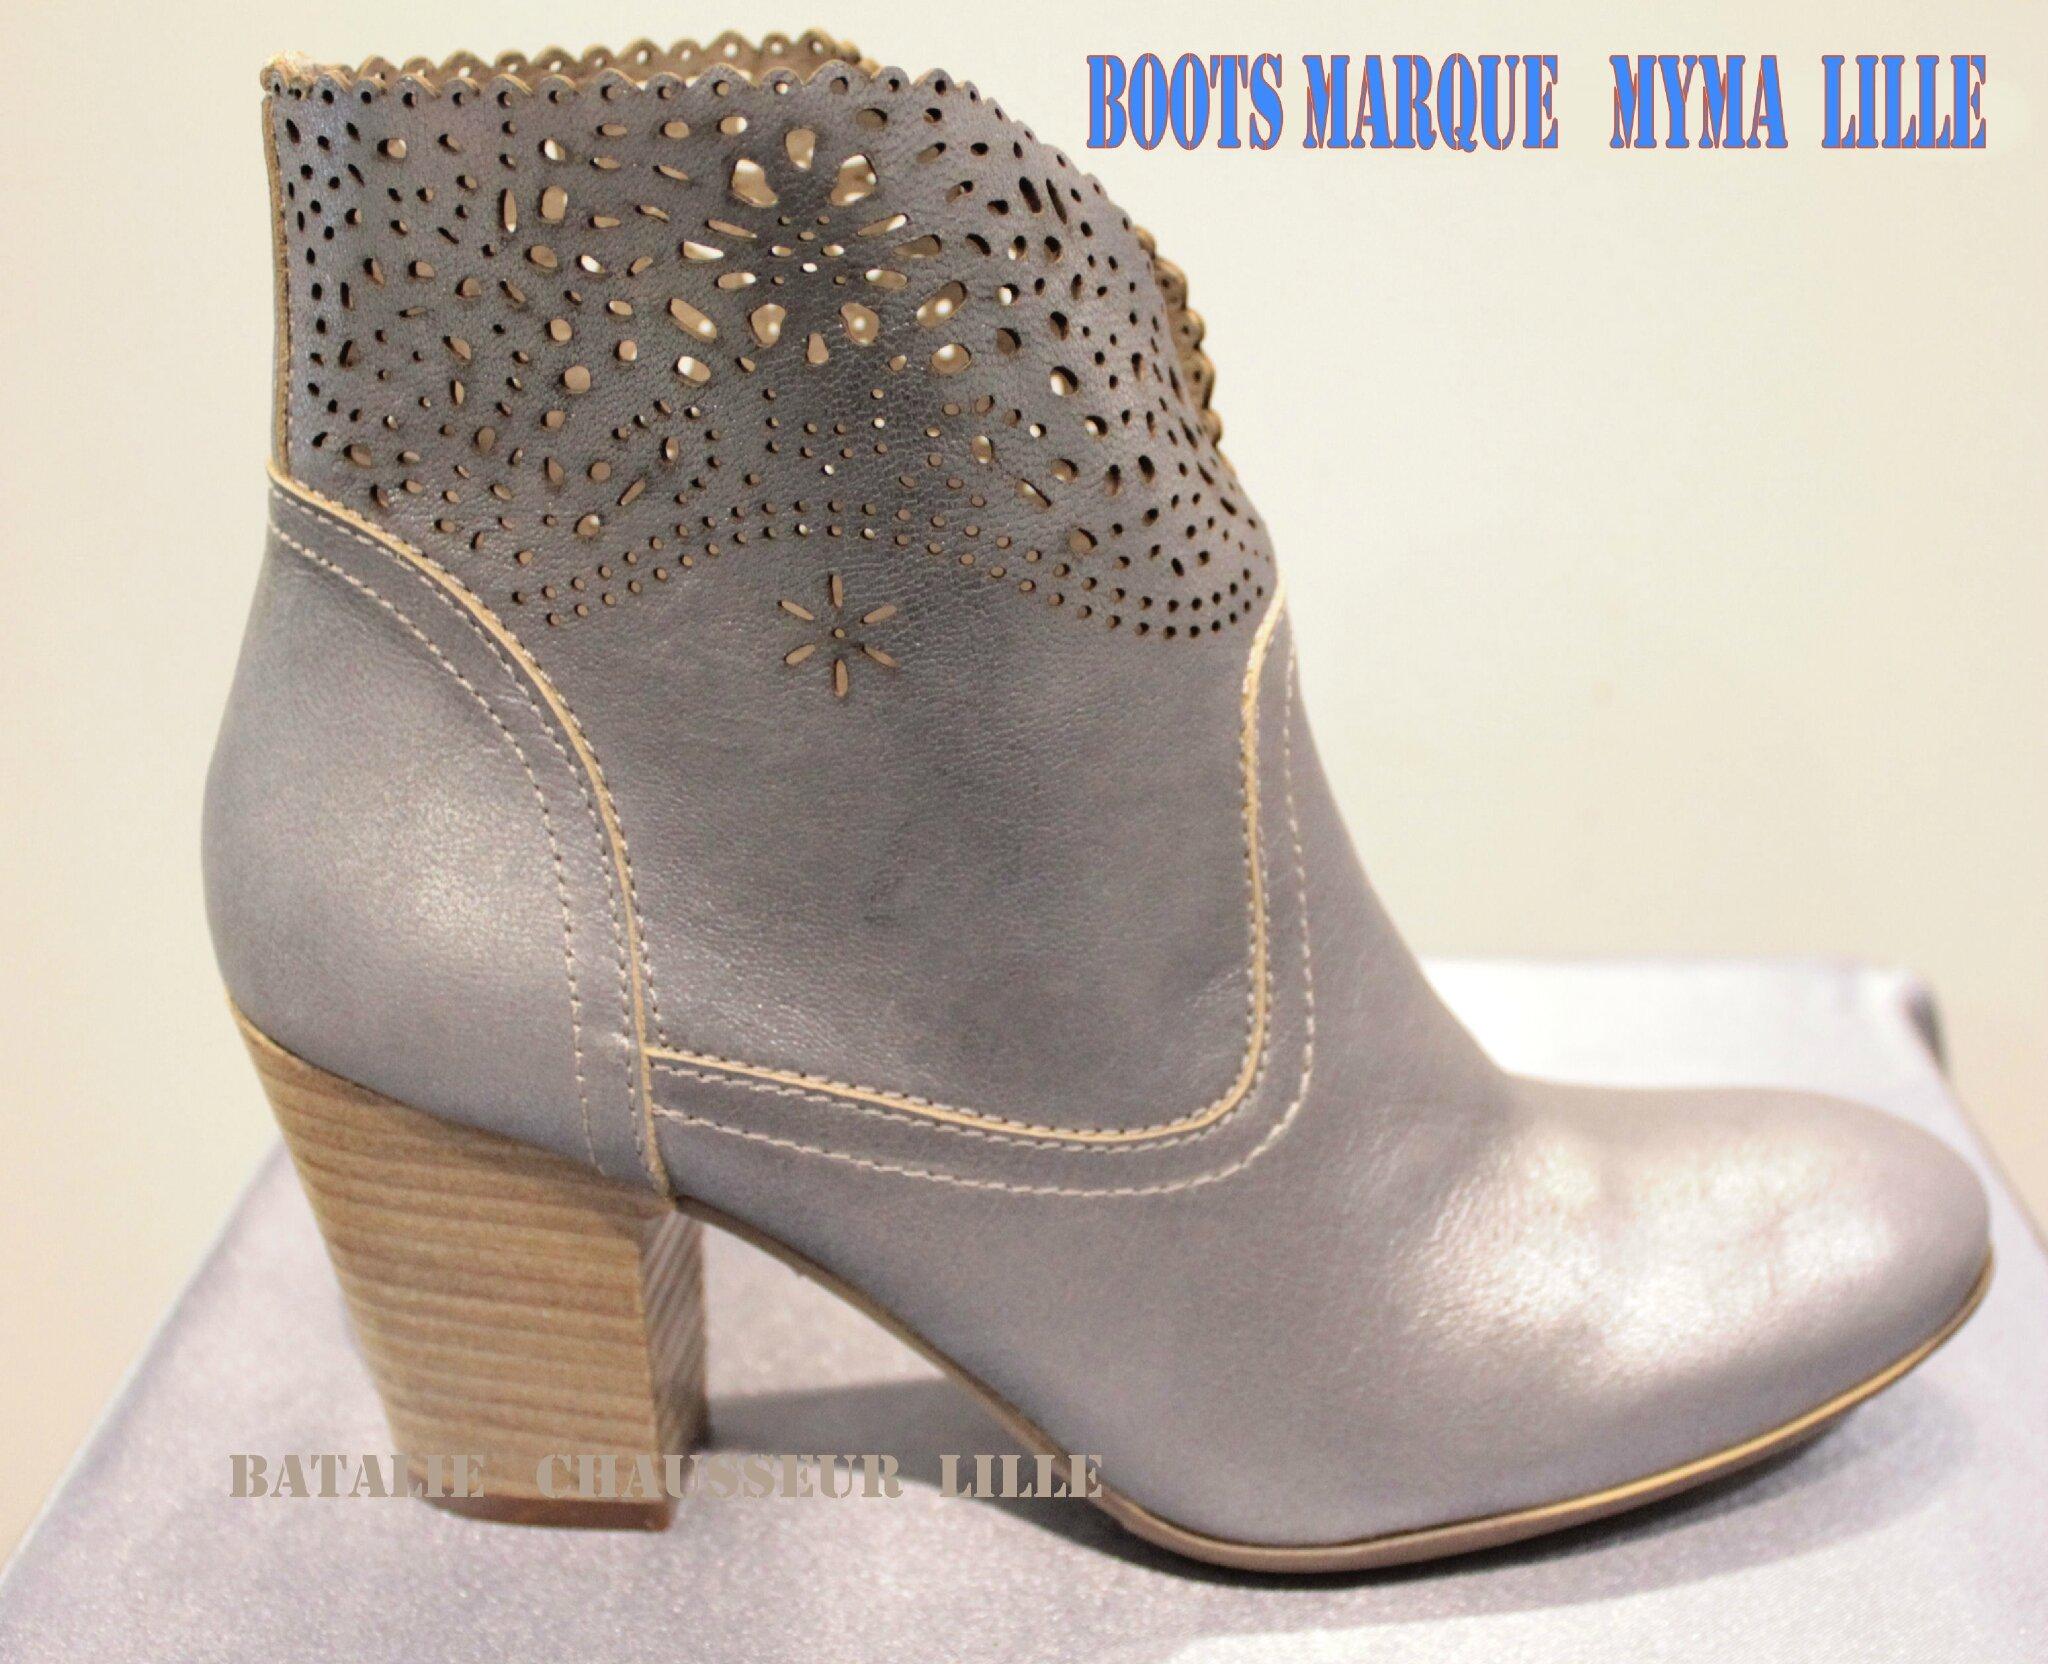 Bunker Marques Collection Chaussures Printemps Femme Gabor Été W9EeHYD2I